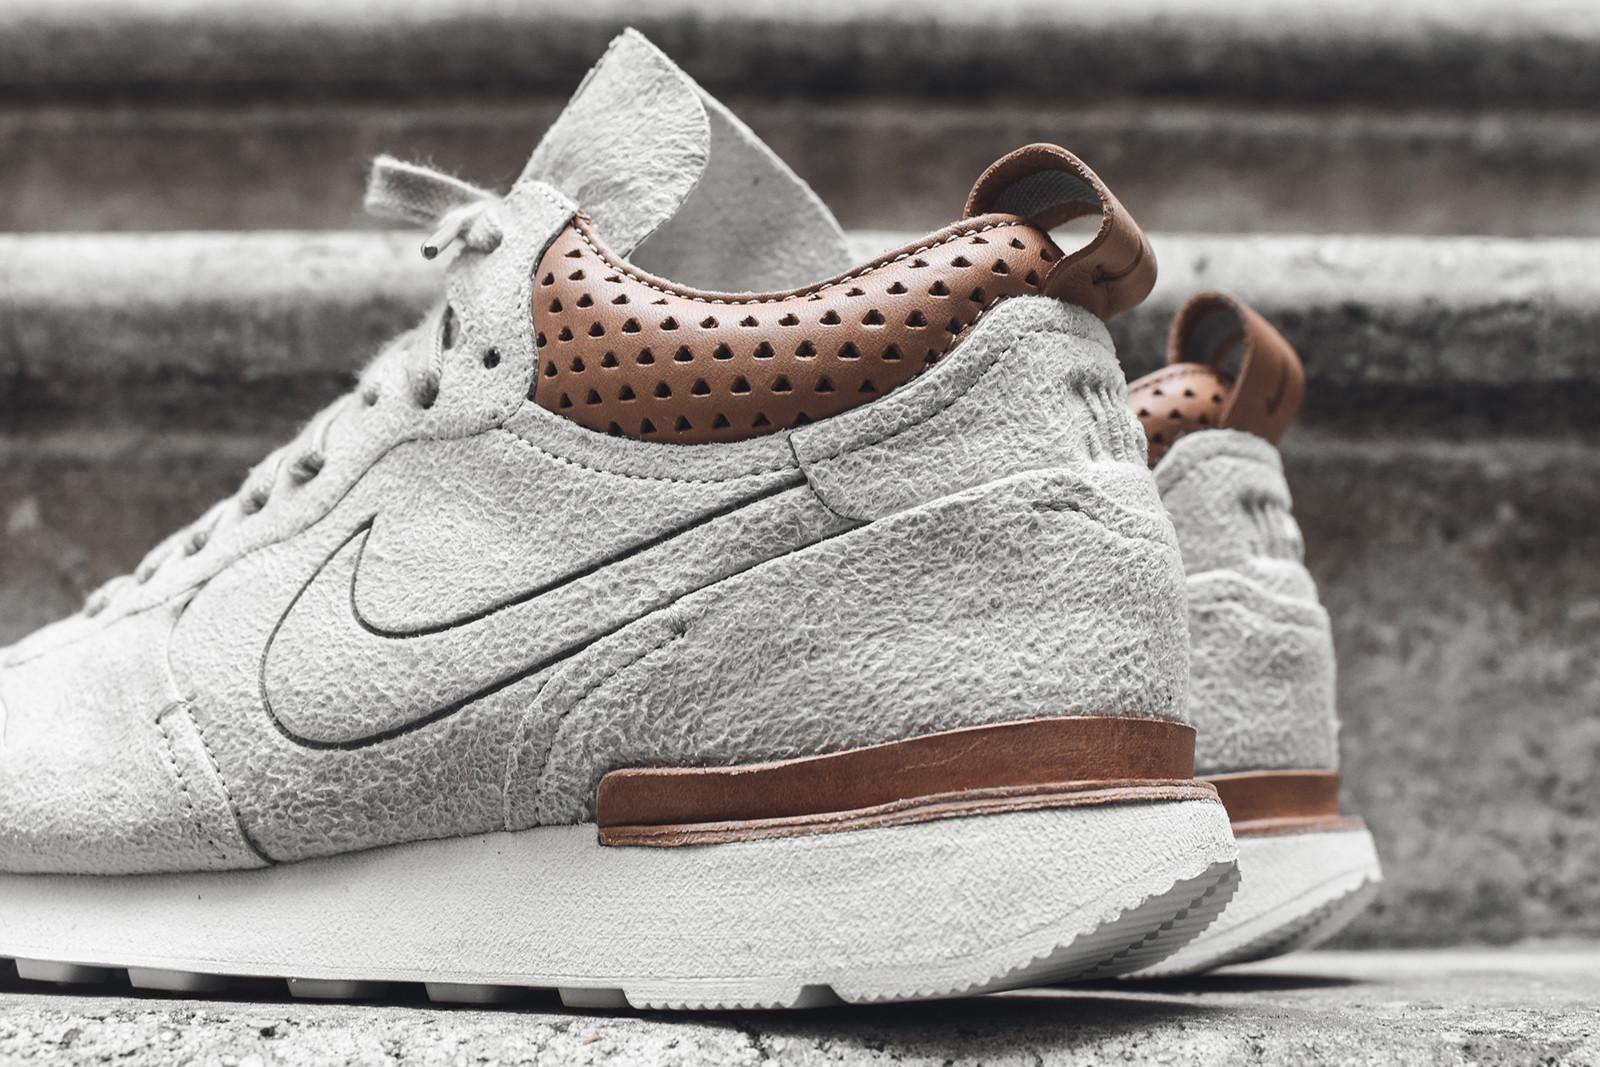 on sale 33d21 ea7bd ... Nike Internationalist Mid Royal - Sandtrap ...